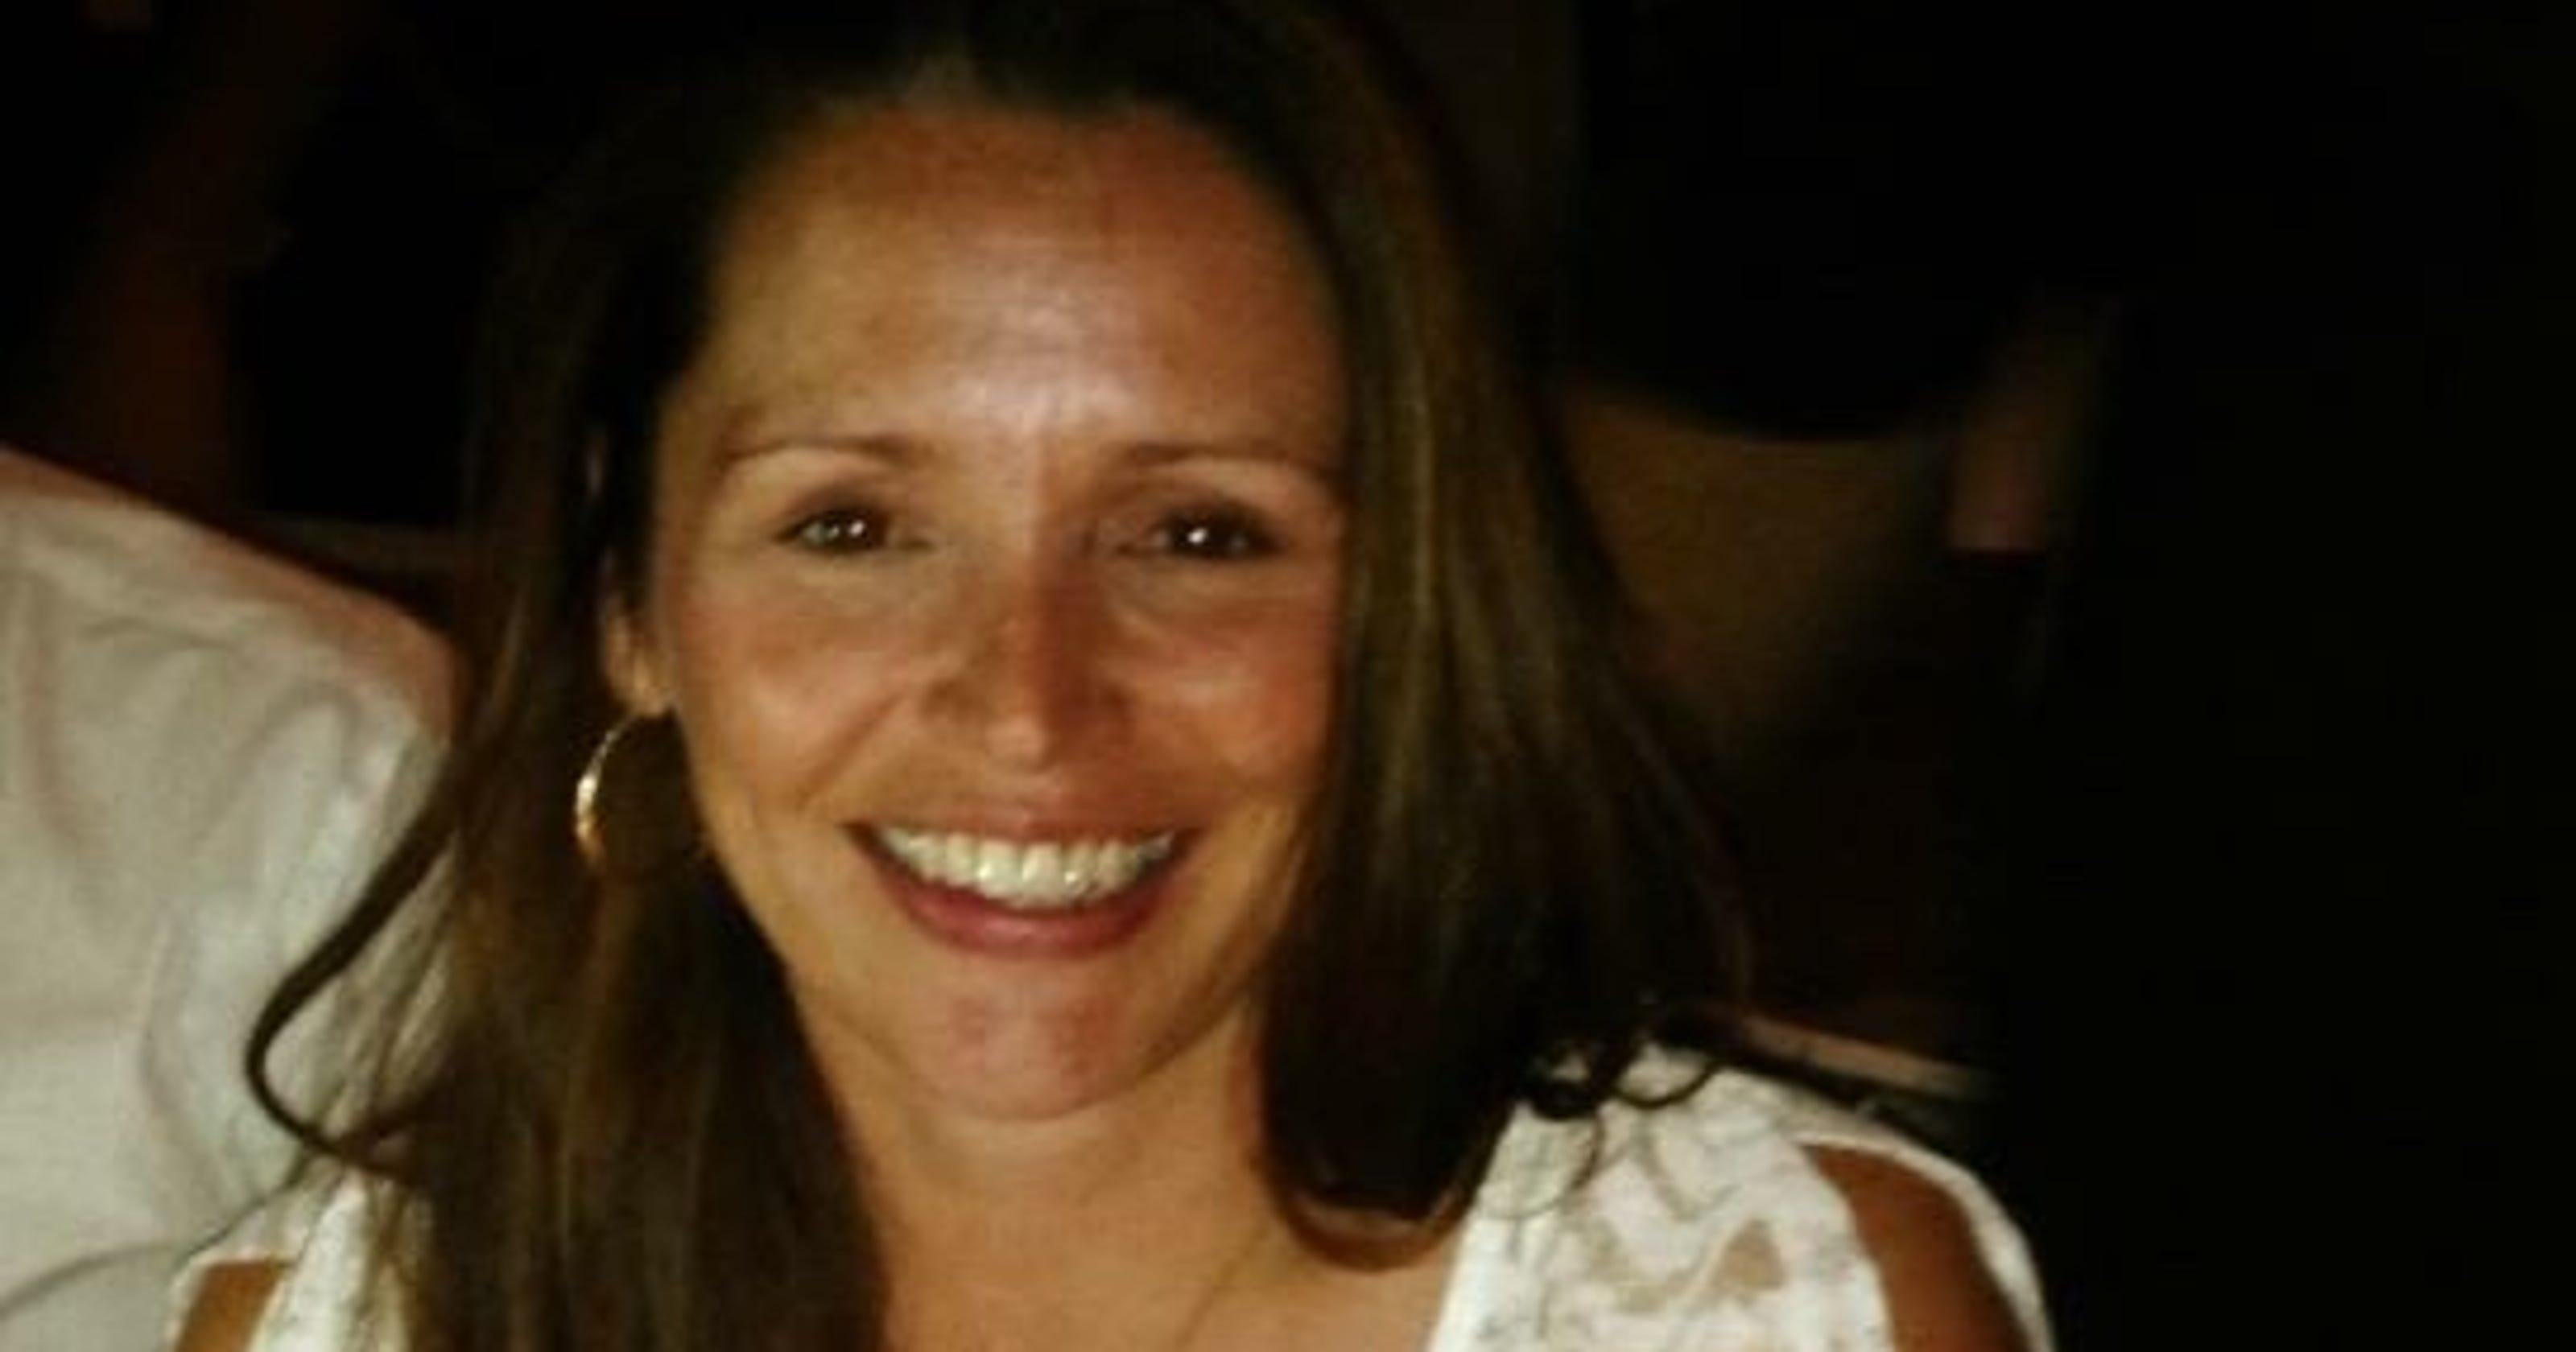 Las Vegas shooting victim Candice Bowers was a single mom of 3